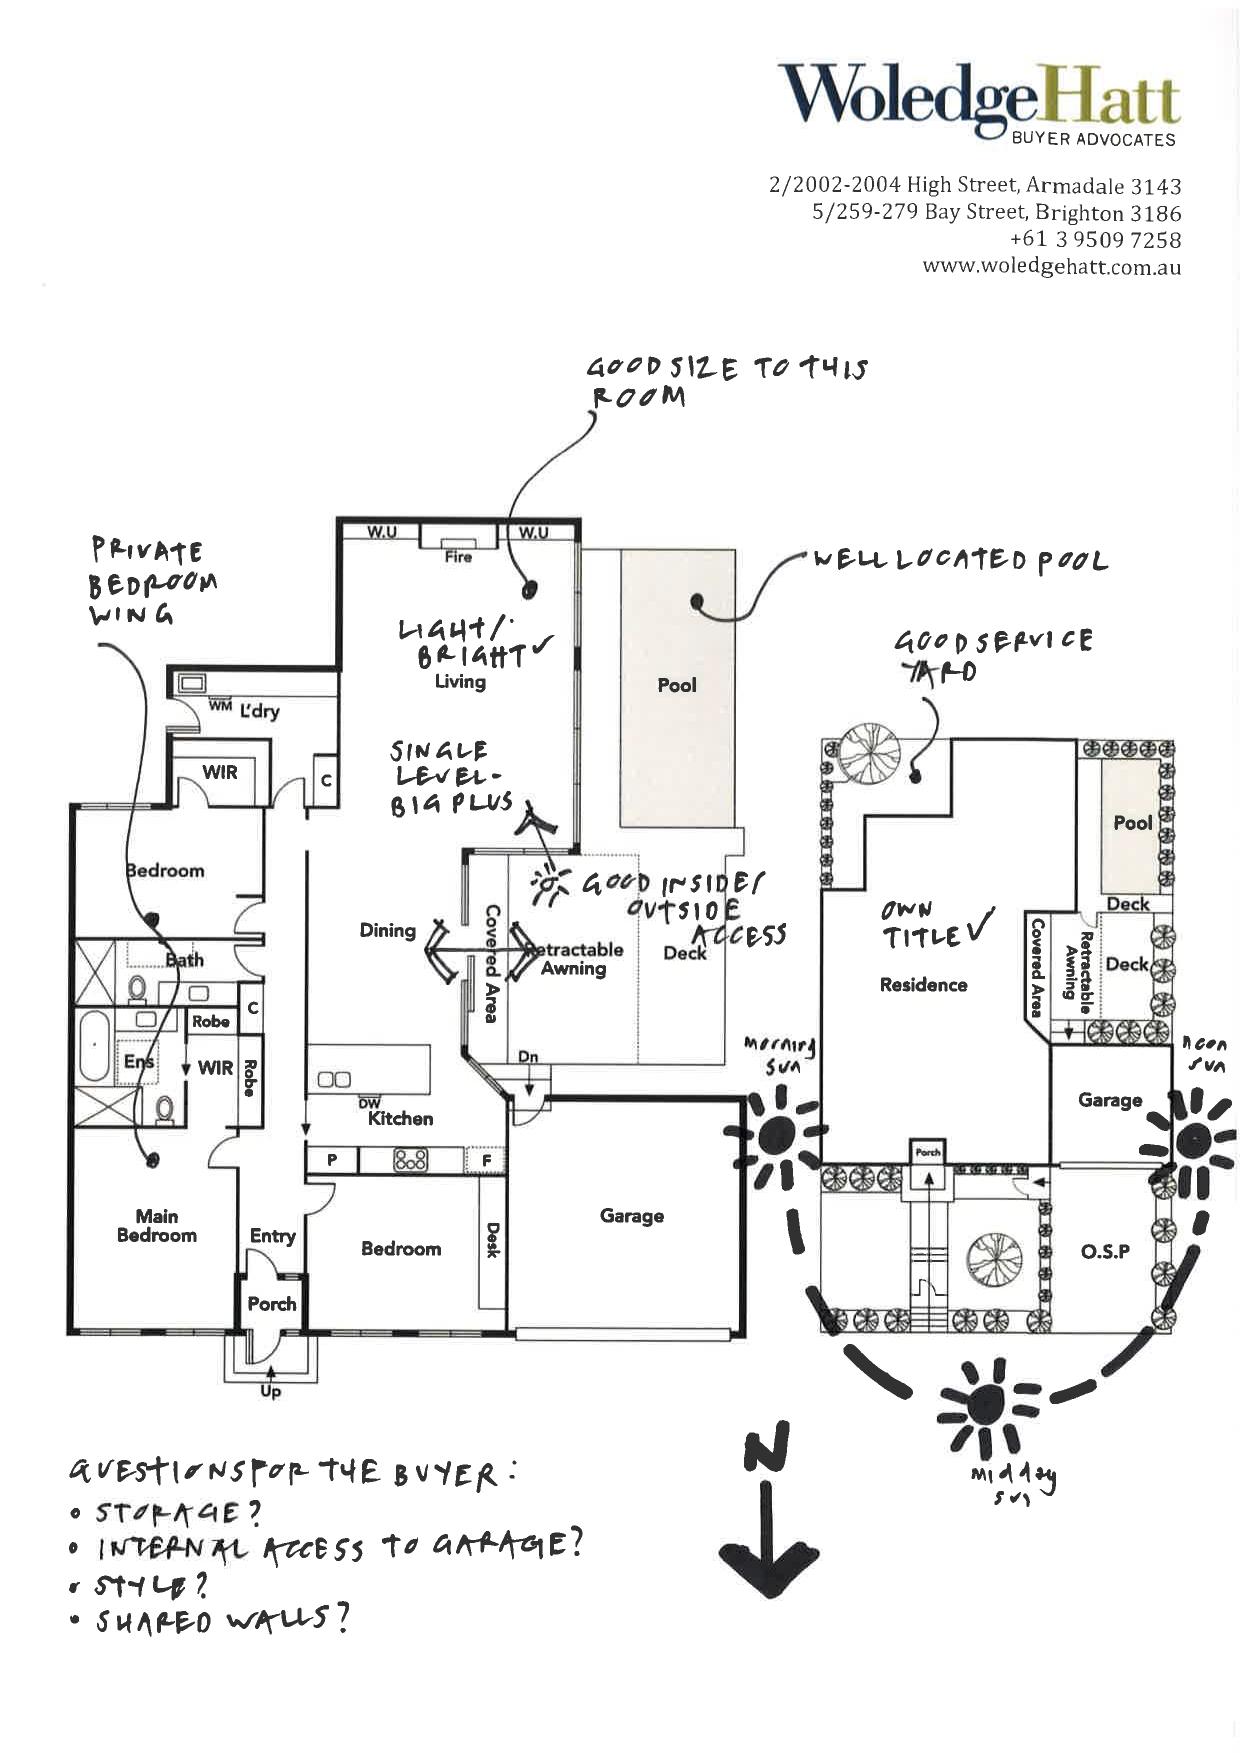 Floorplan Analysis